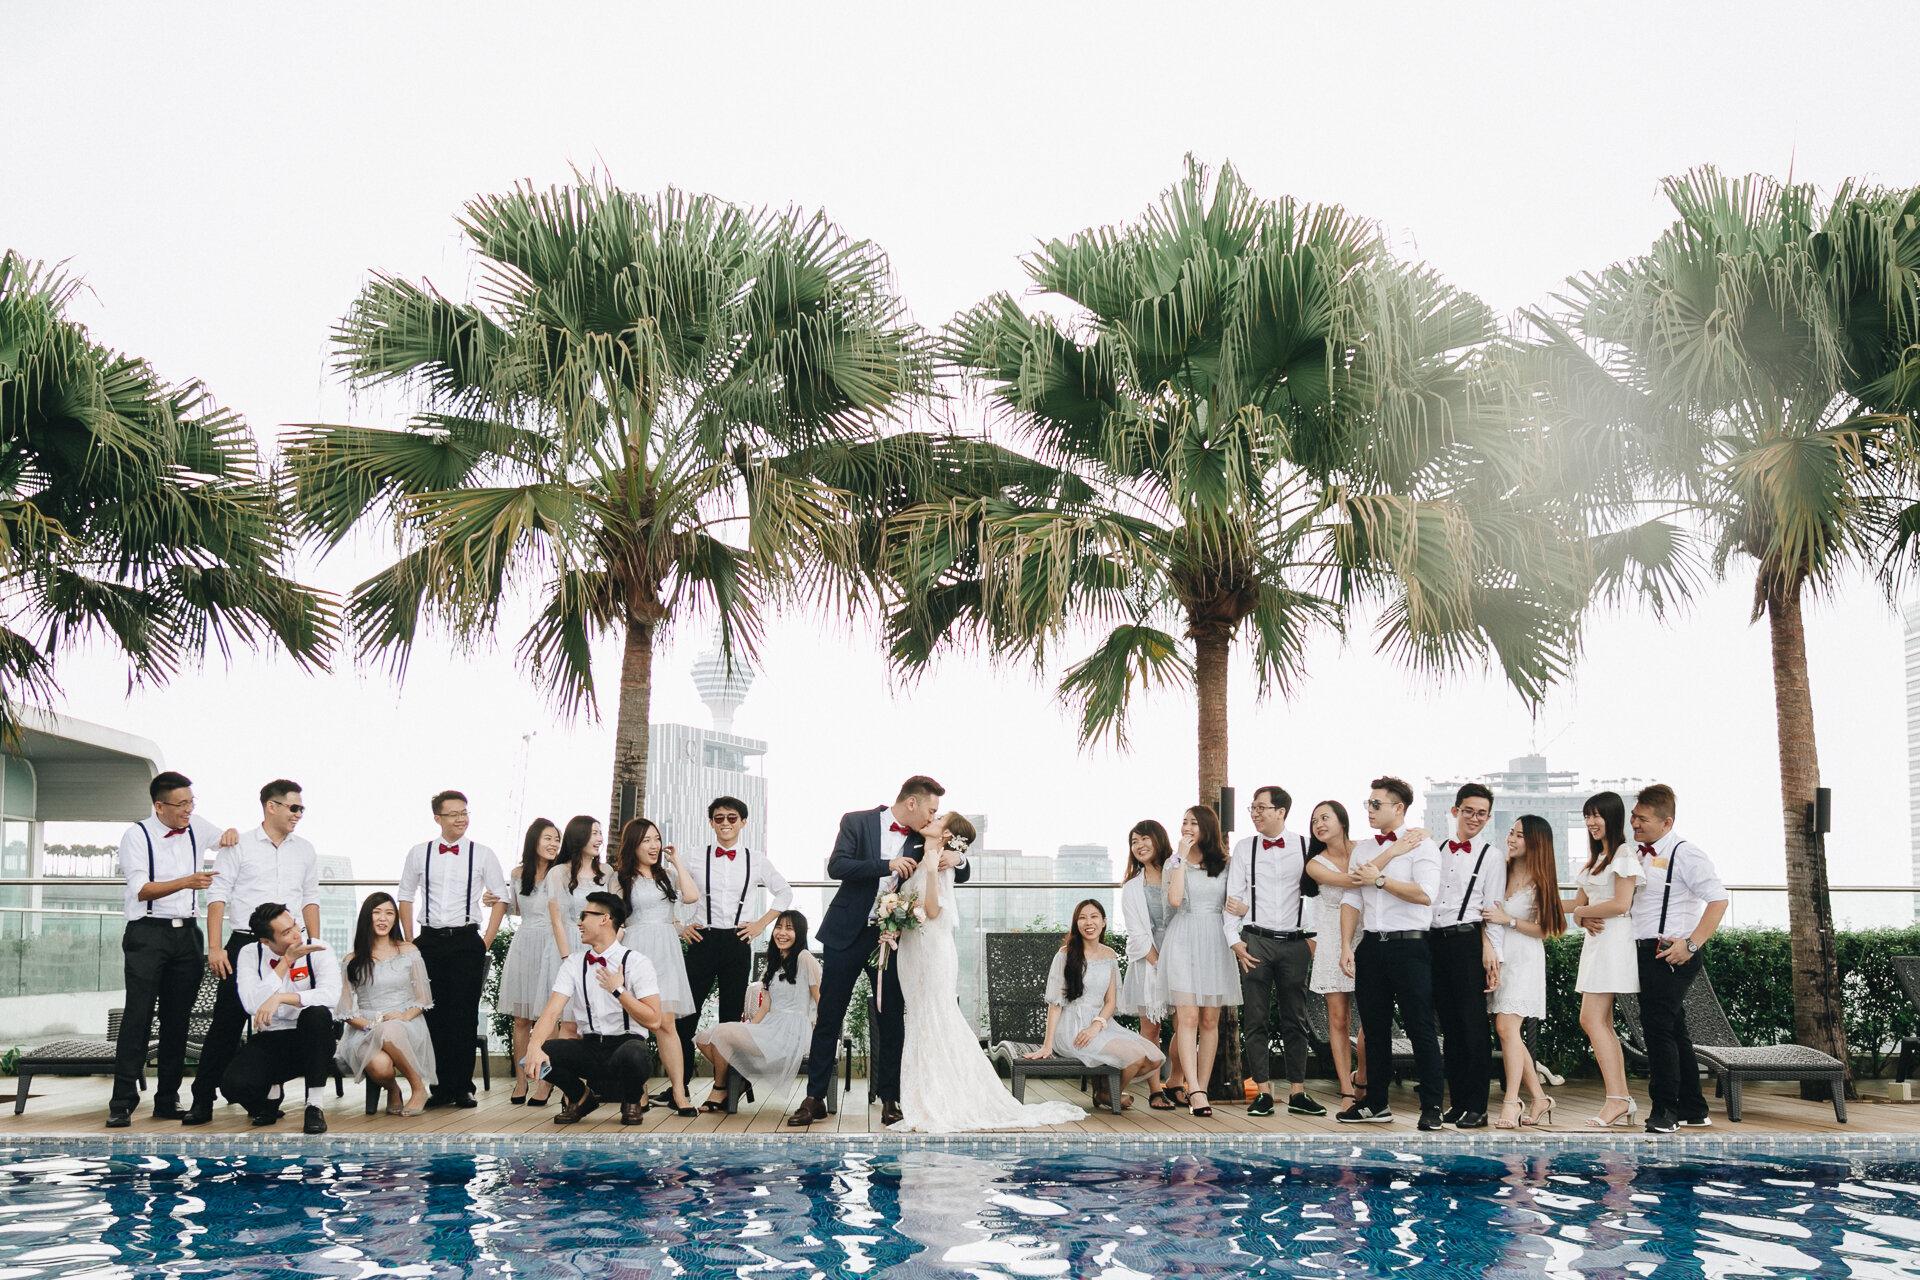 GOAY & SUEY - Chinese Wedding